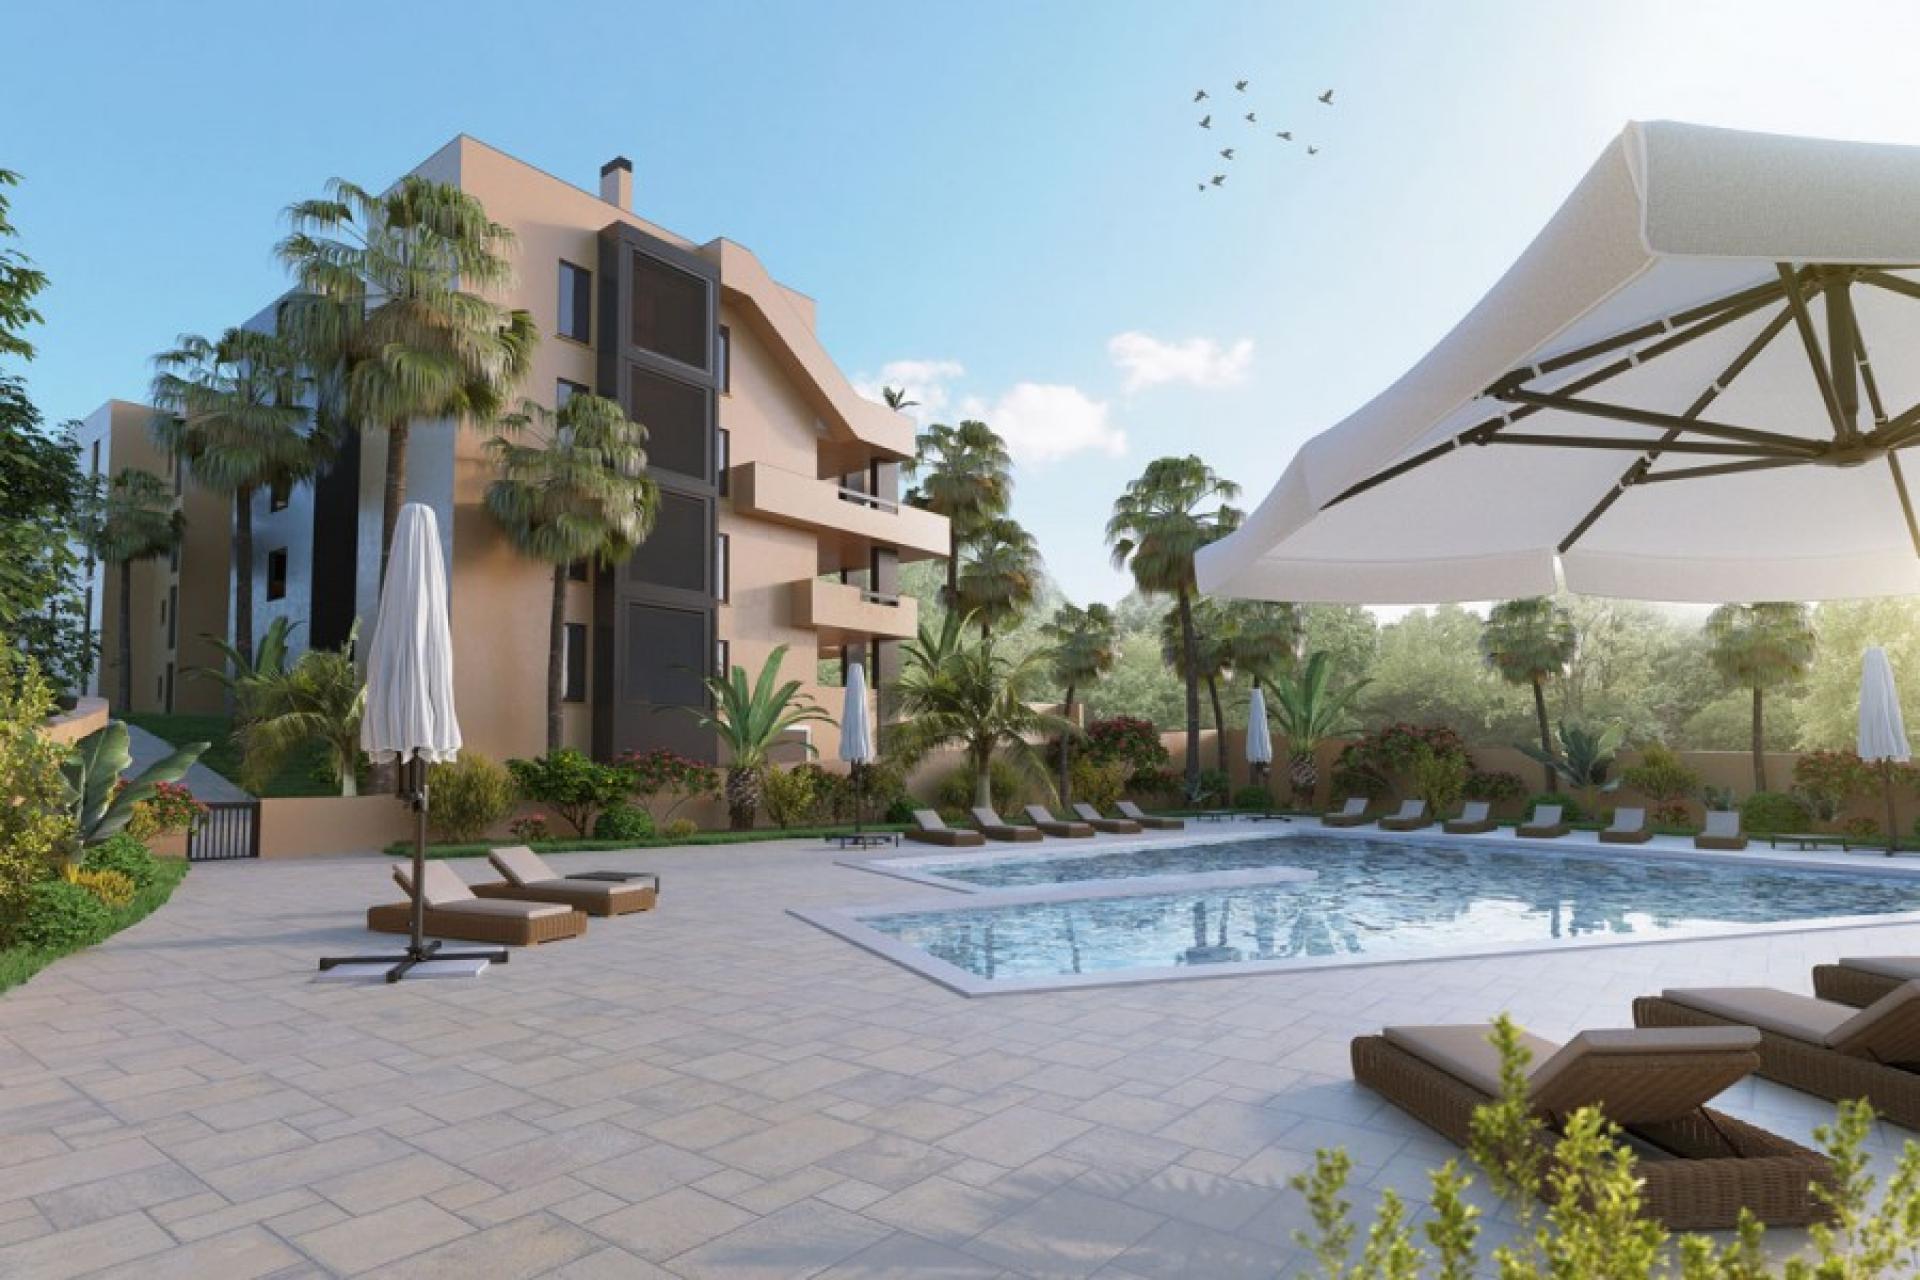 Palapa golf residencial - Villamartin